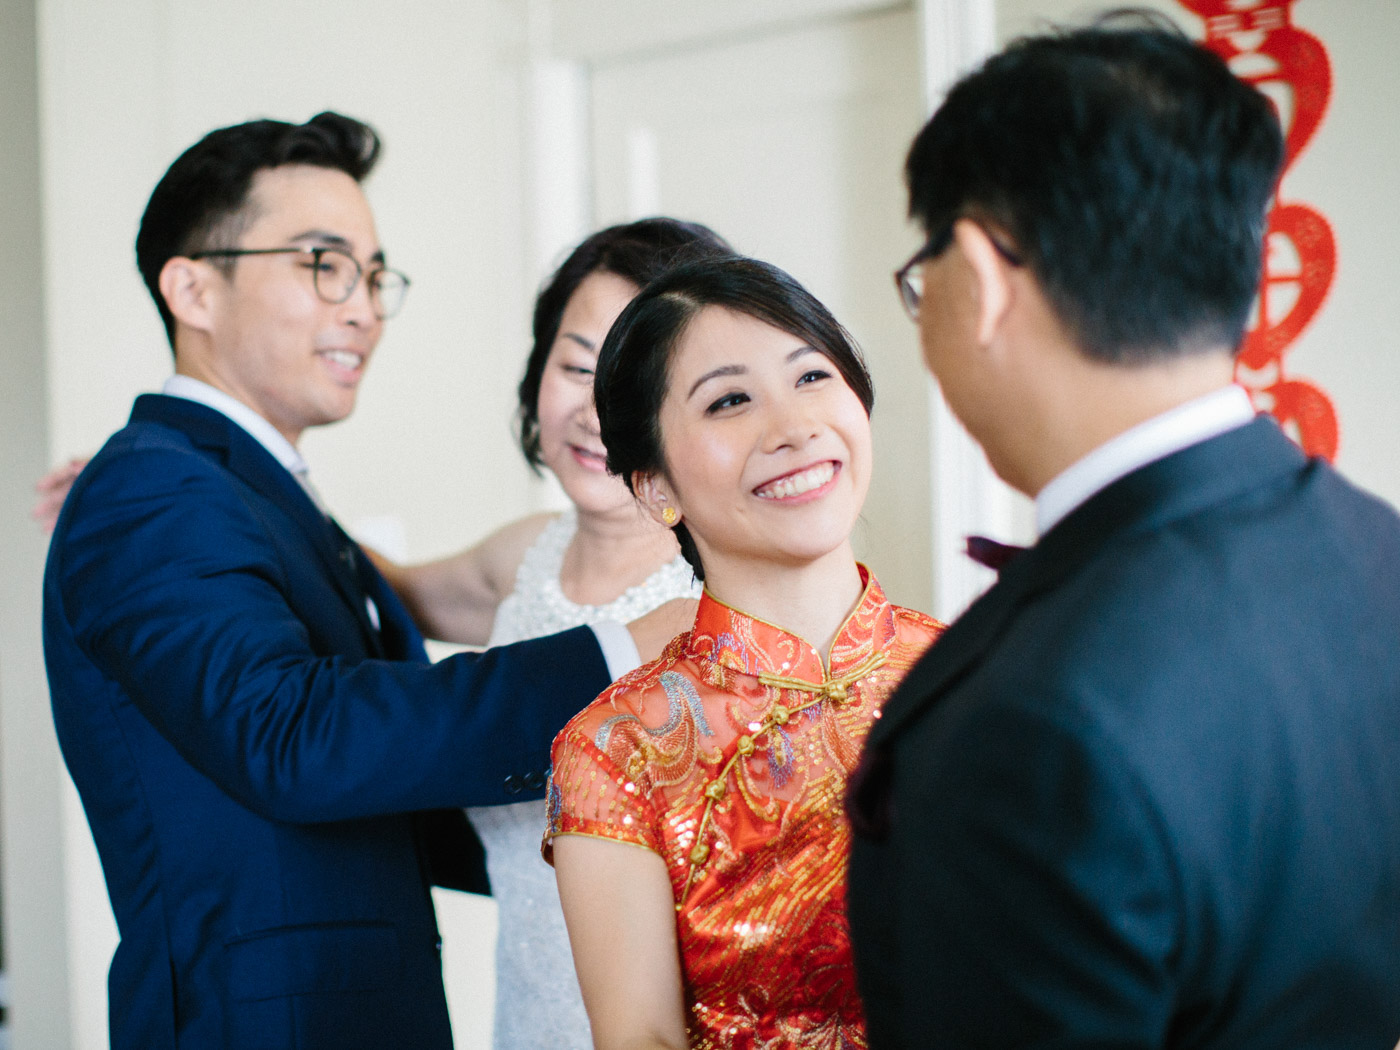 toronto_wedding_photographer_fine_art_documentary_photography-55.jpg